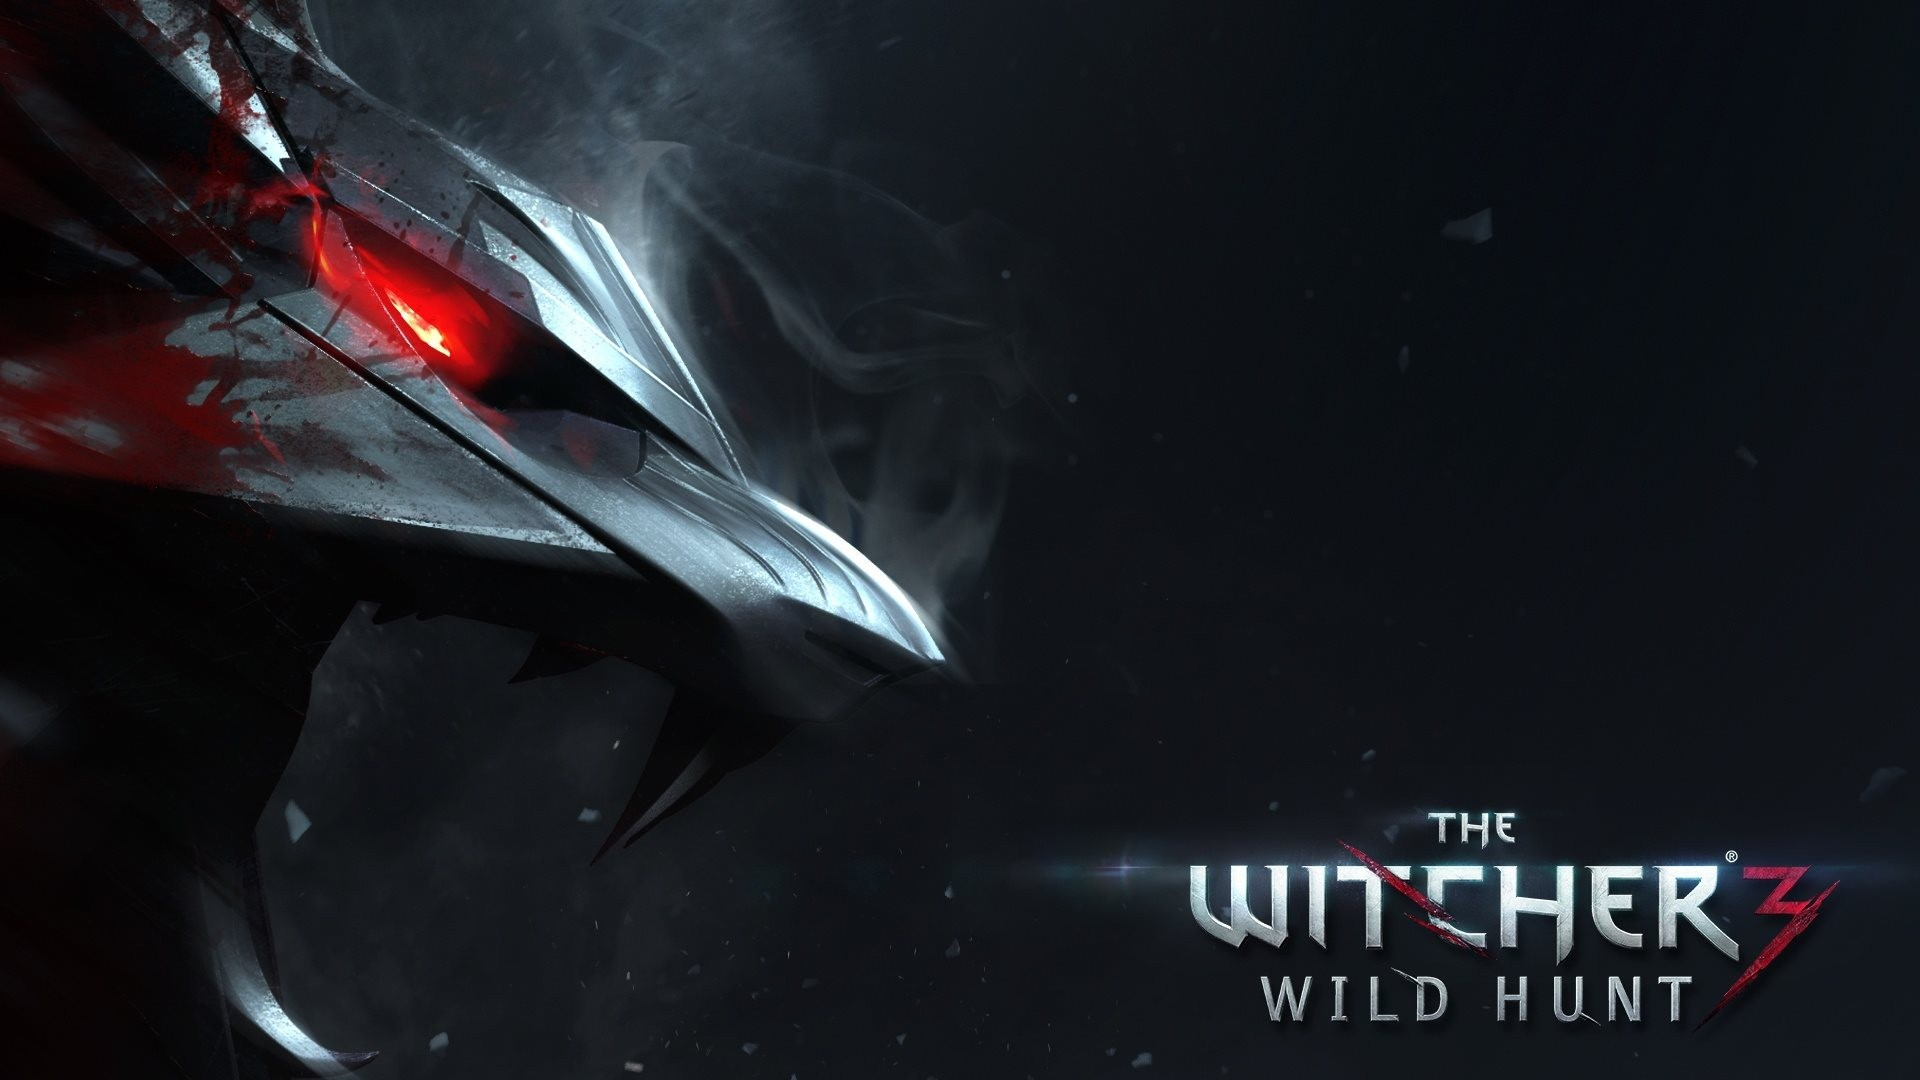 Witcher 3 Wallpaper 4k Download Free Wallpapers For Desktop